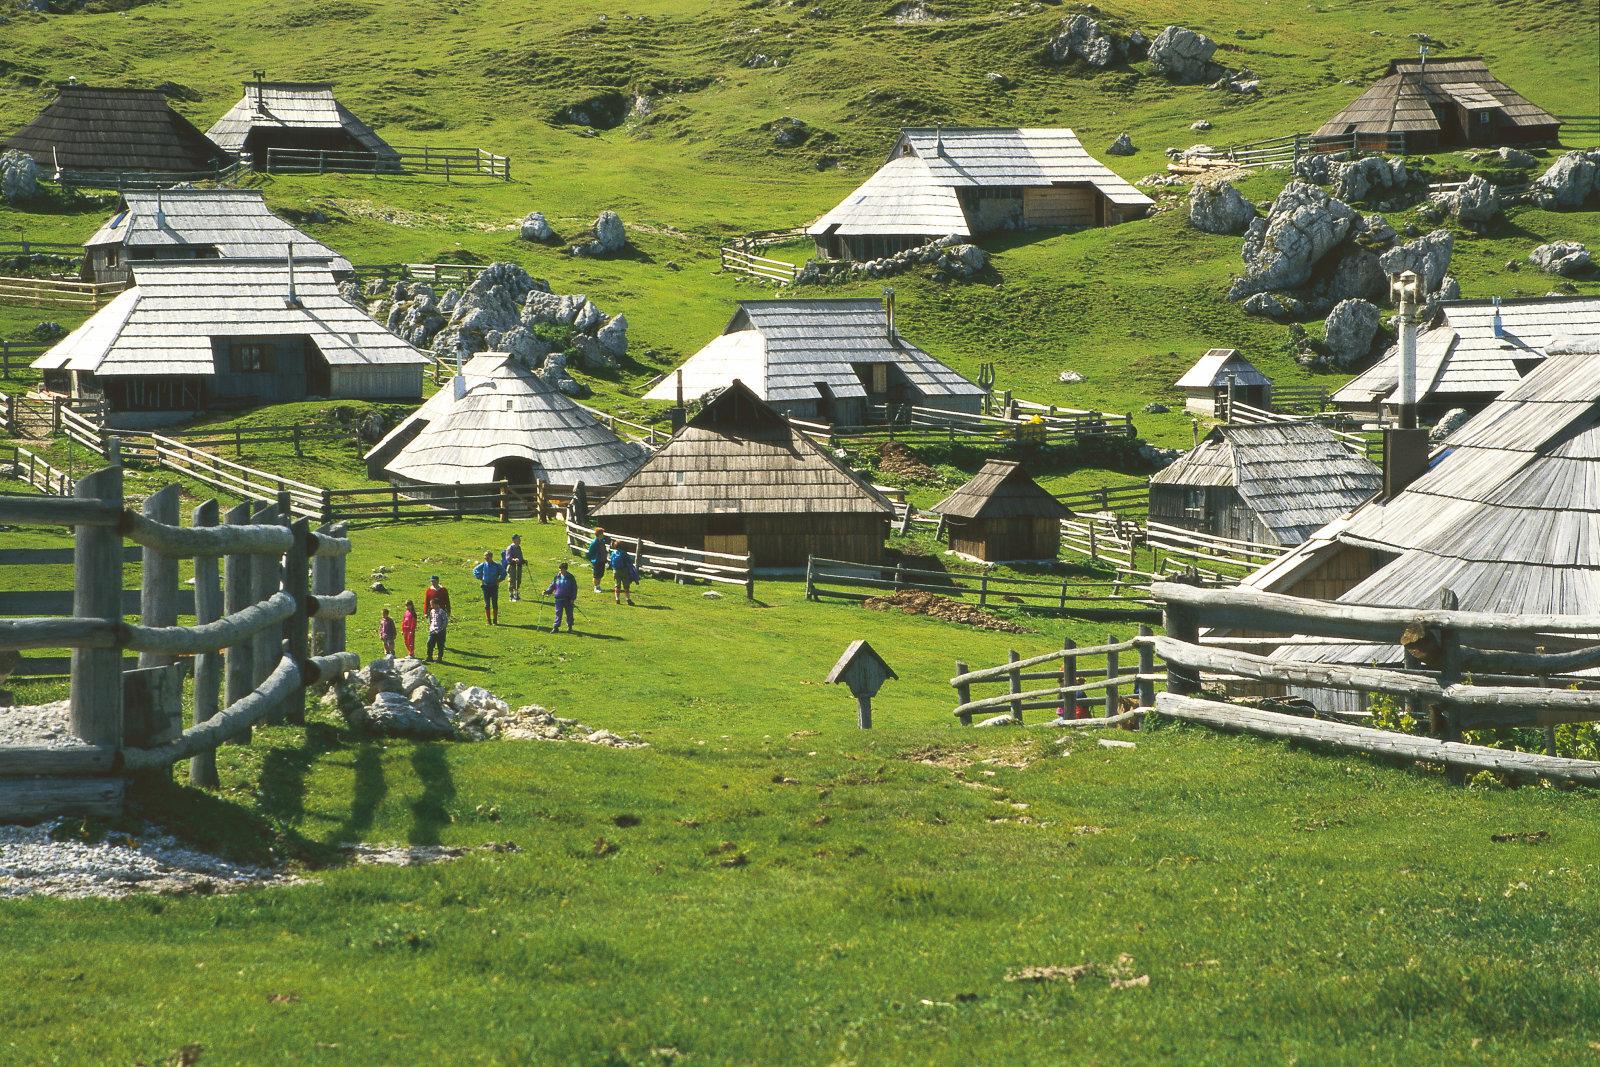 velika-planina-wooden-huts